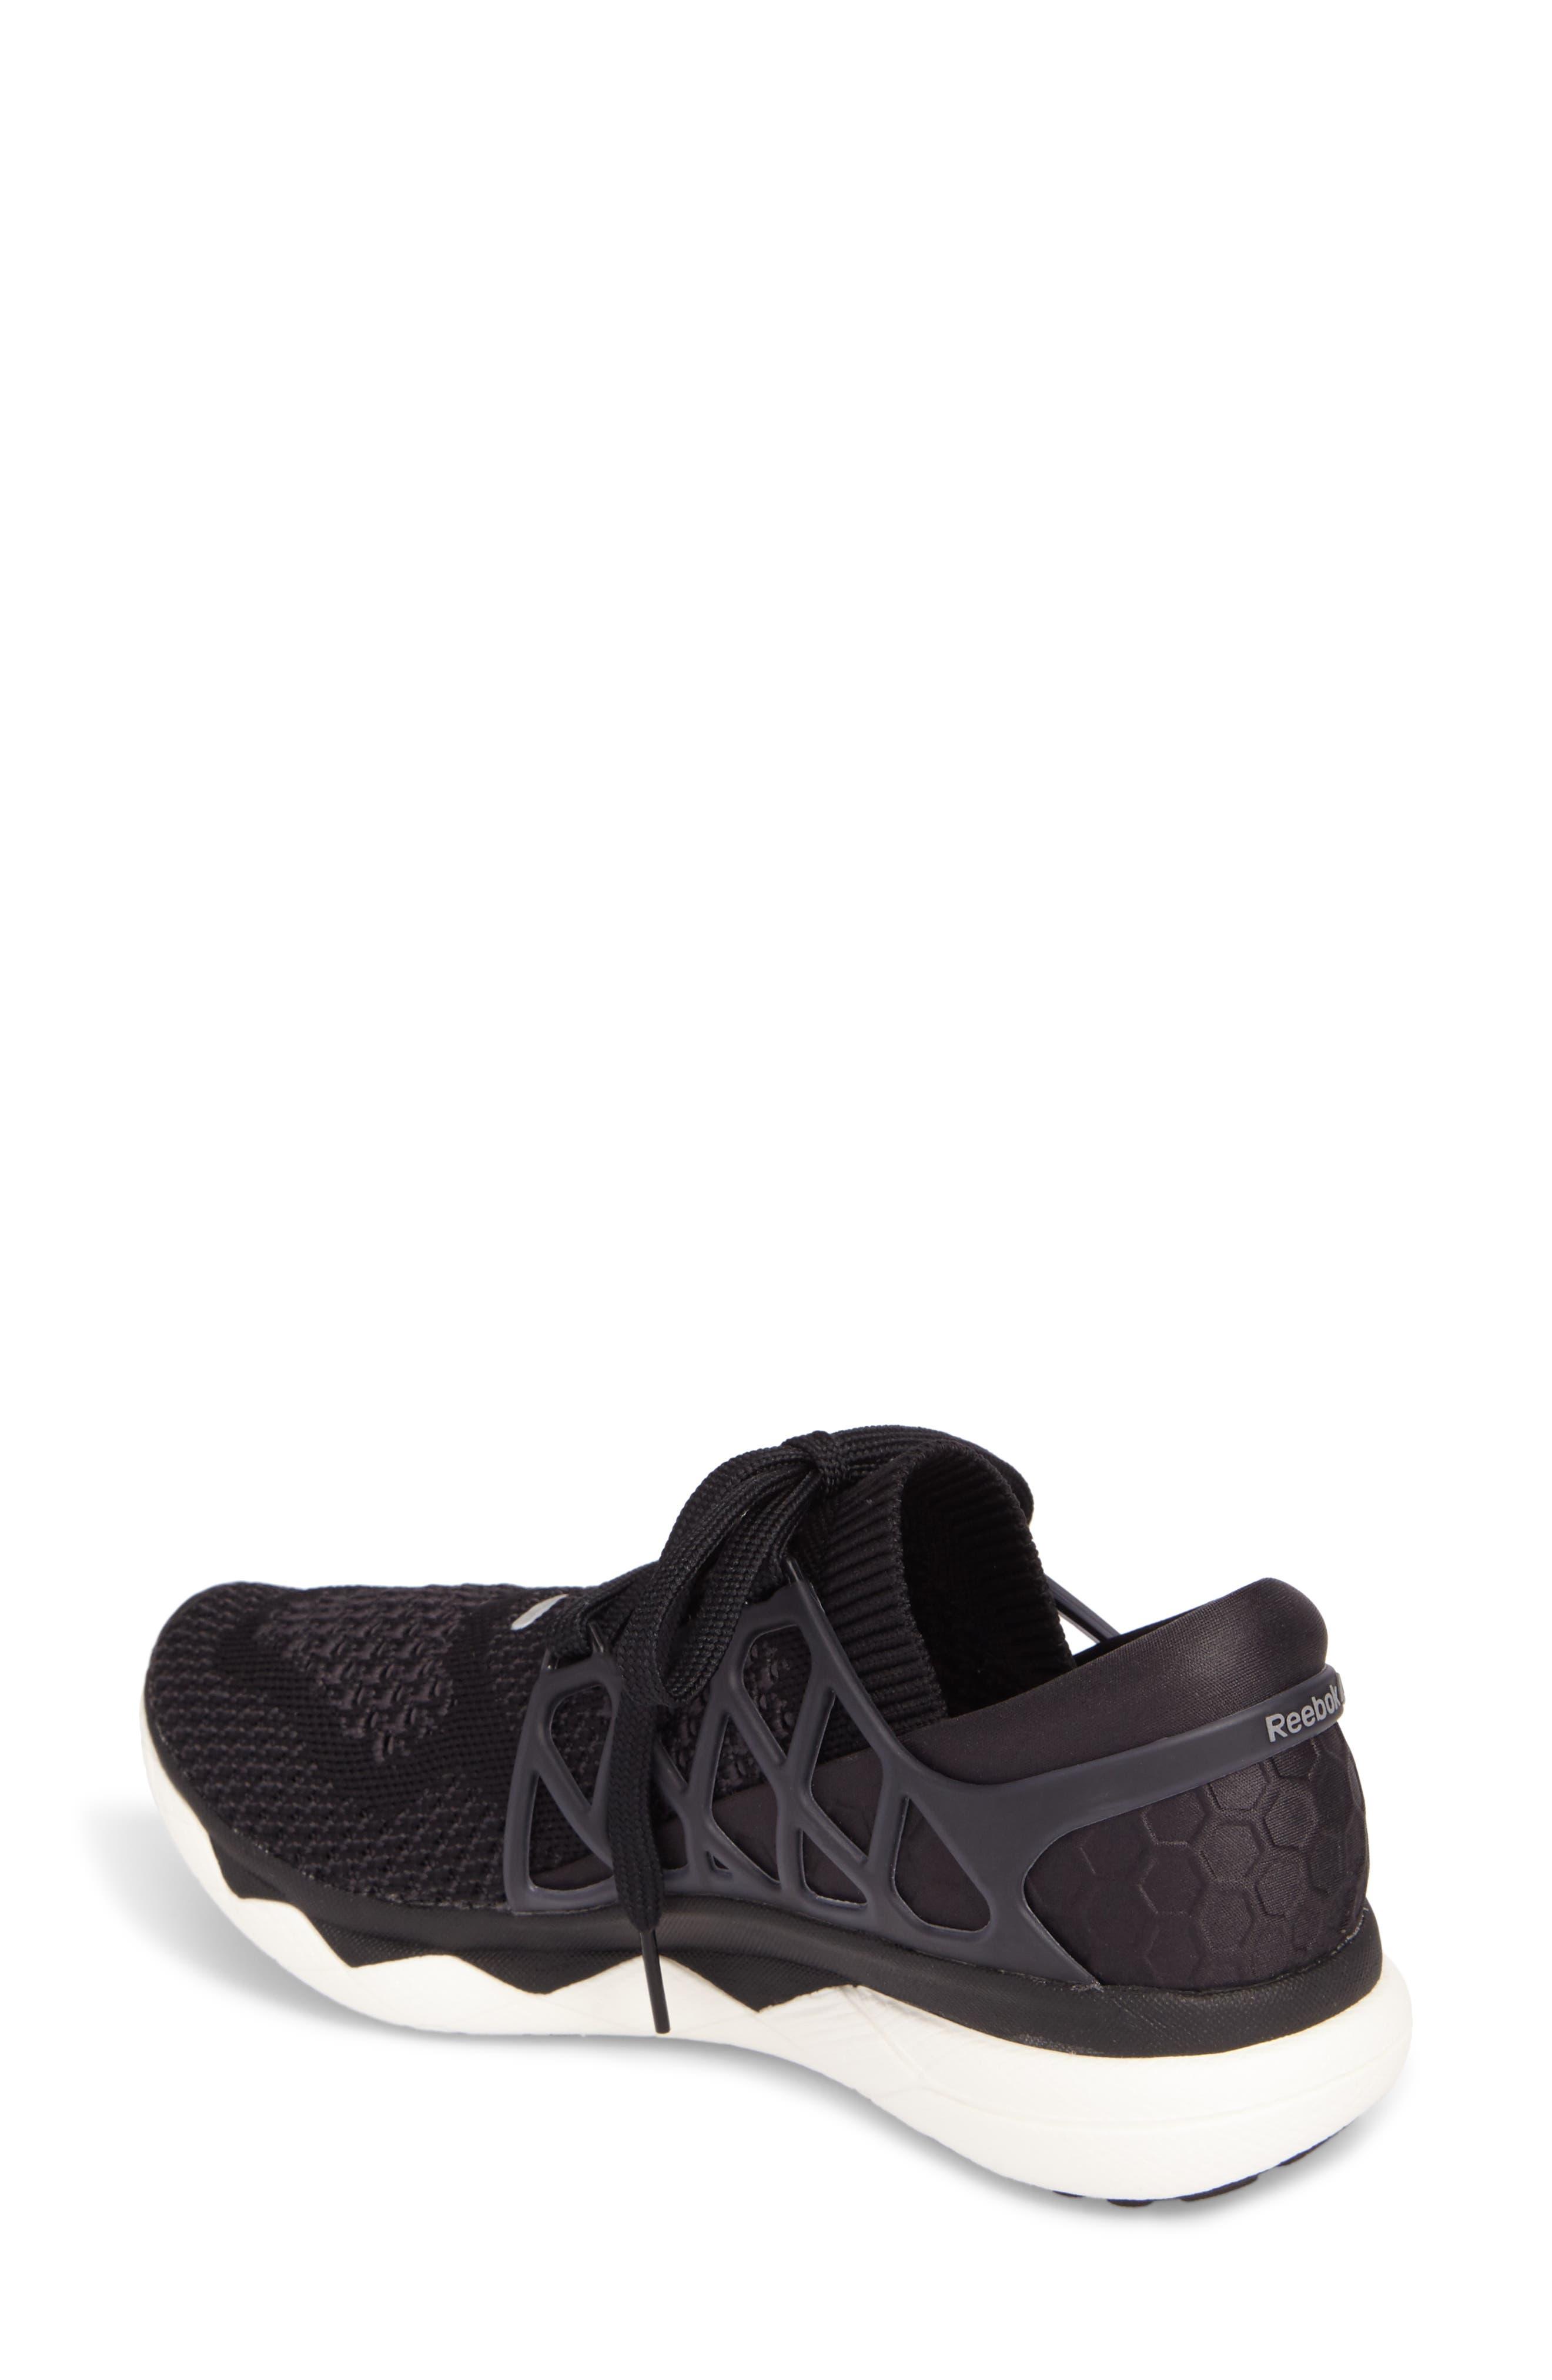 REEBOK,                             Floatride Run Running Shoe,                             Alternate thumbnail 2, color,                             001